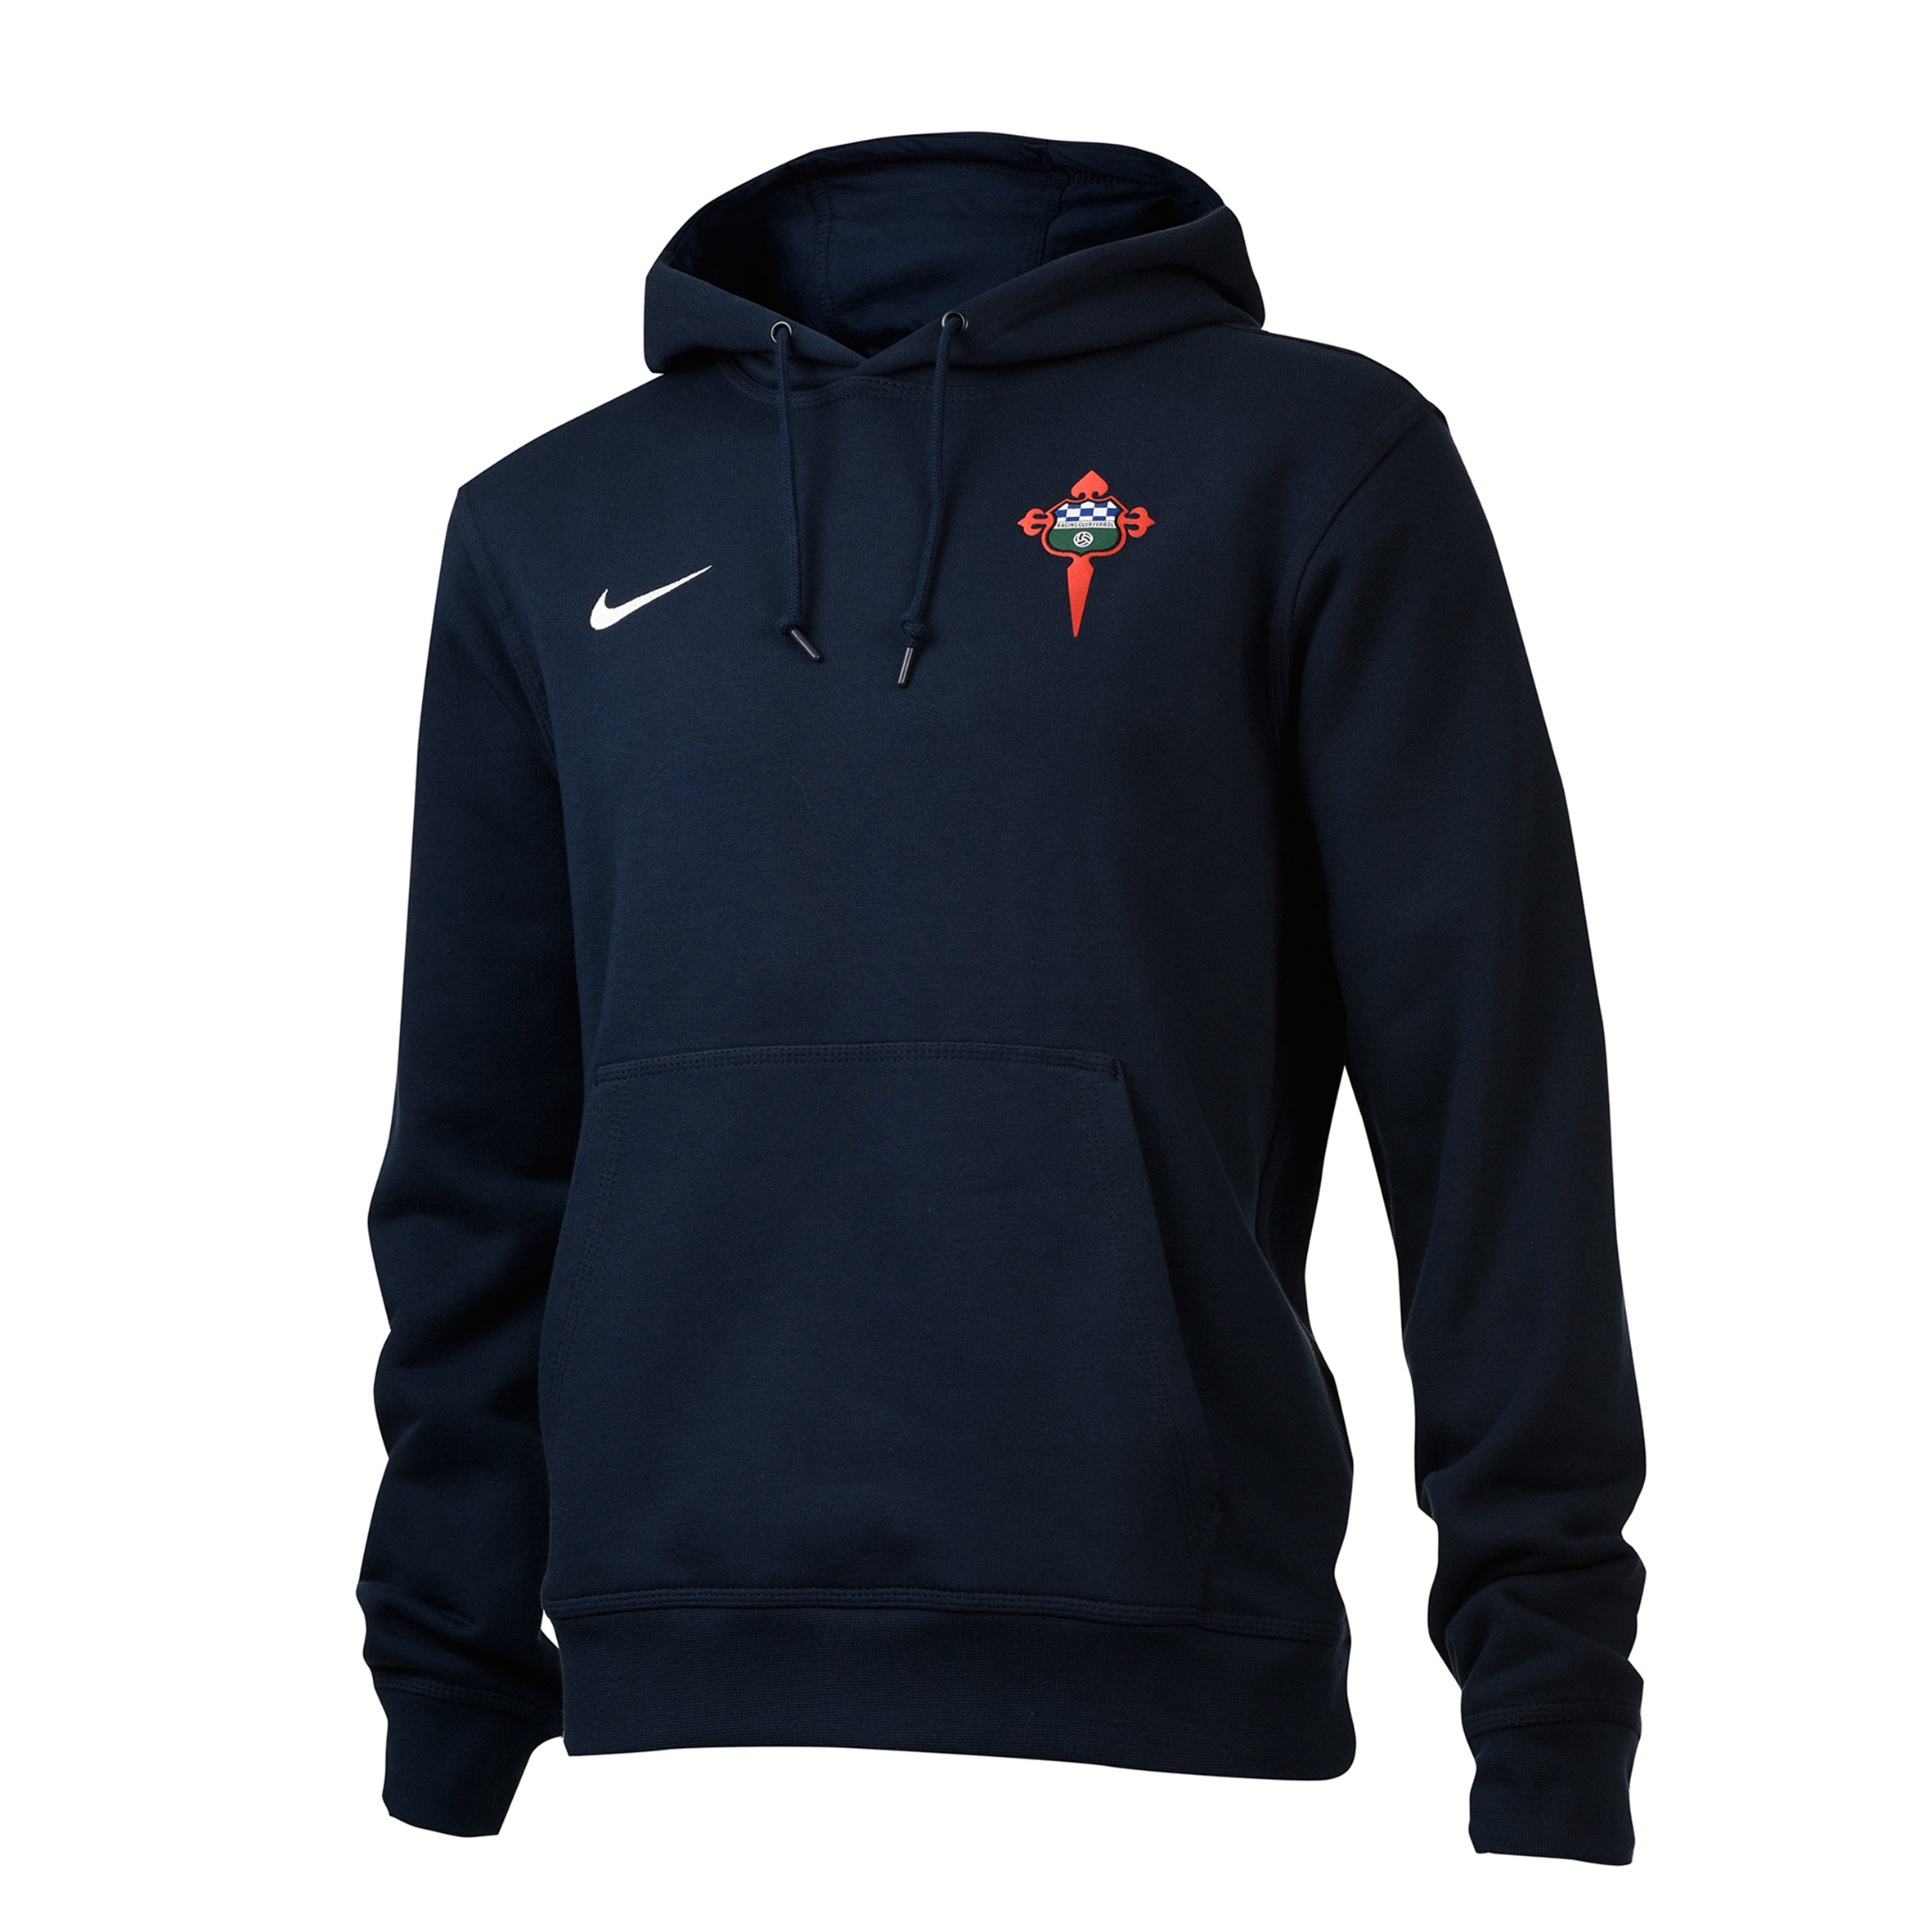 Sudadera Capucha – Nike RCF – Niño